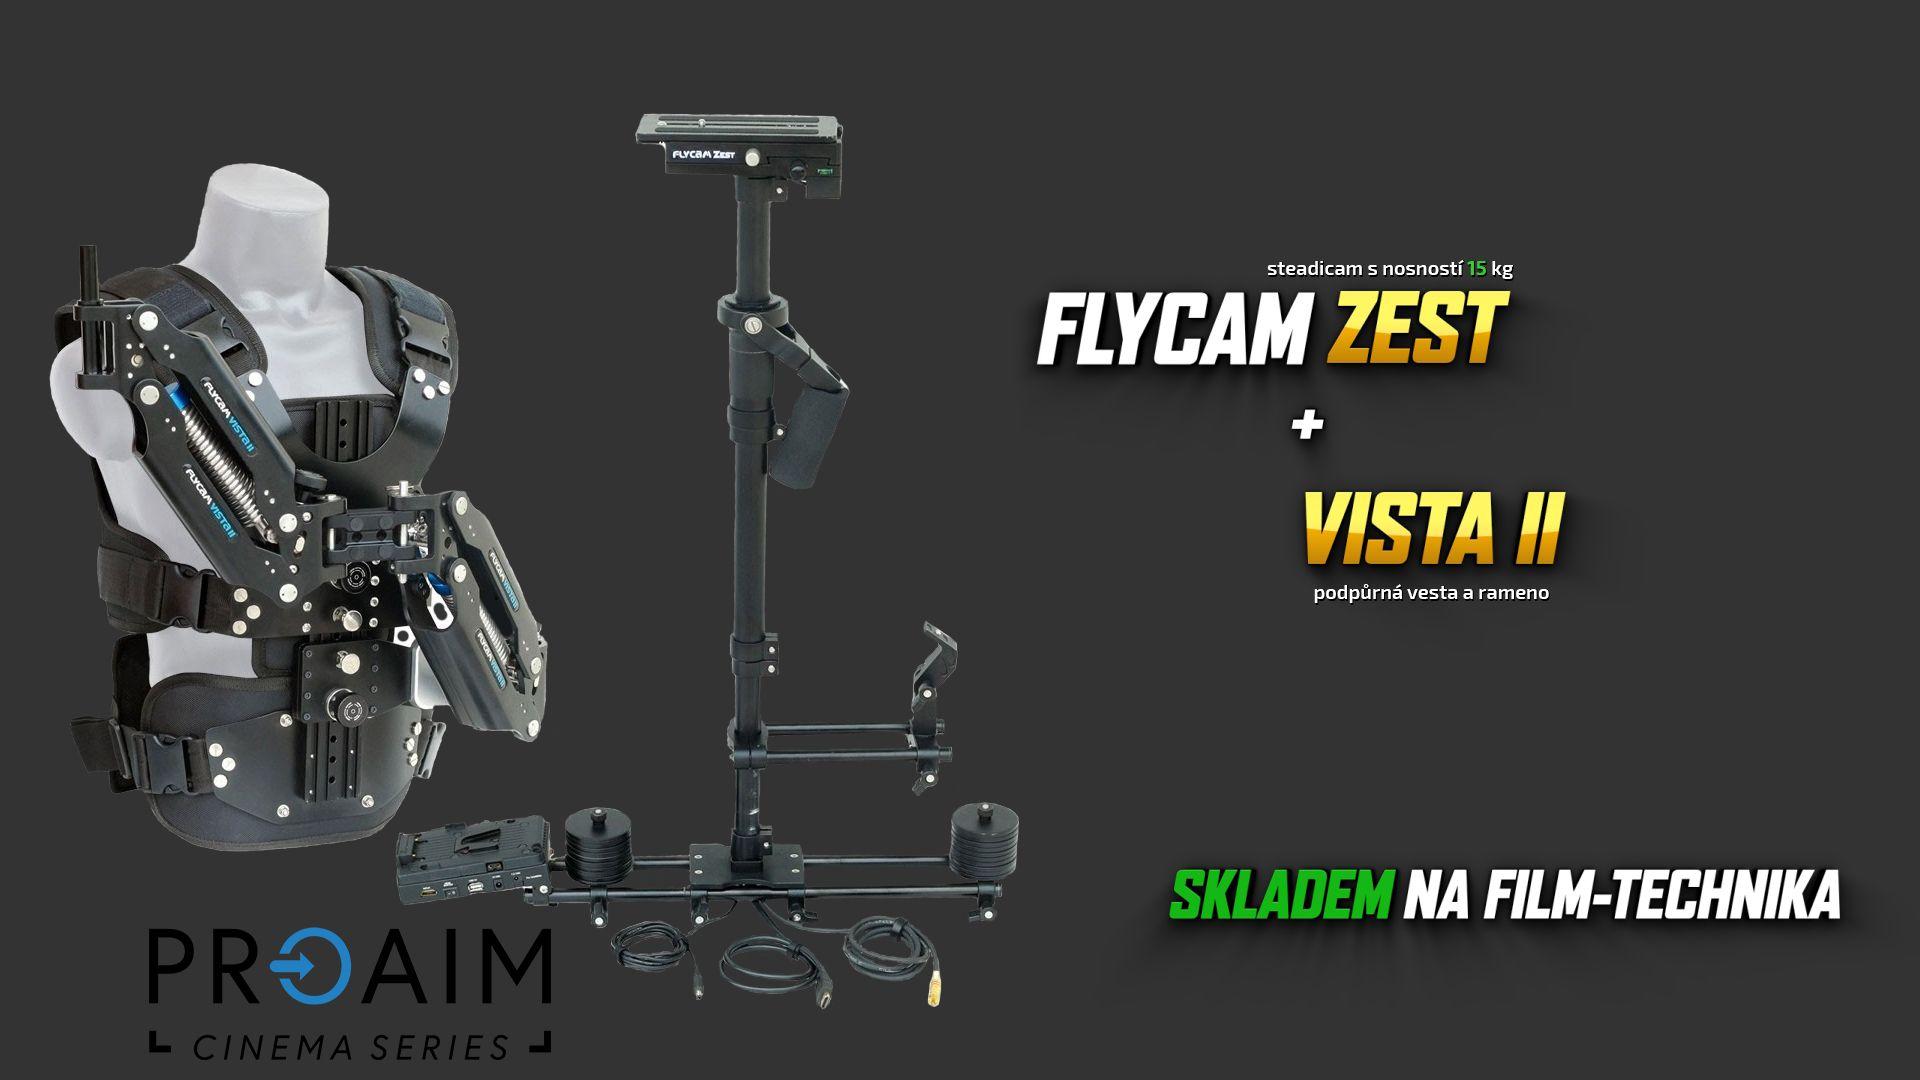 film-tehnika-proaim-zest-vista-ii-intext1